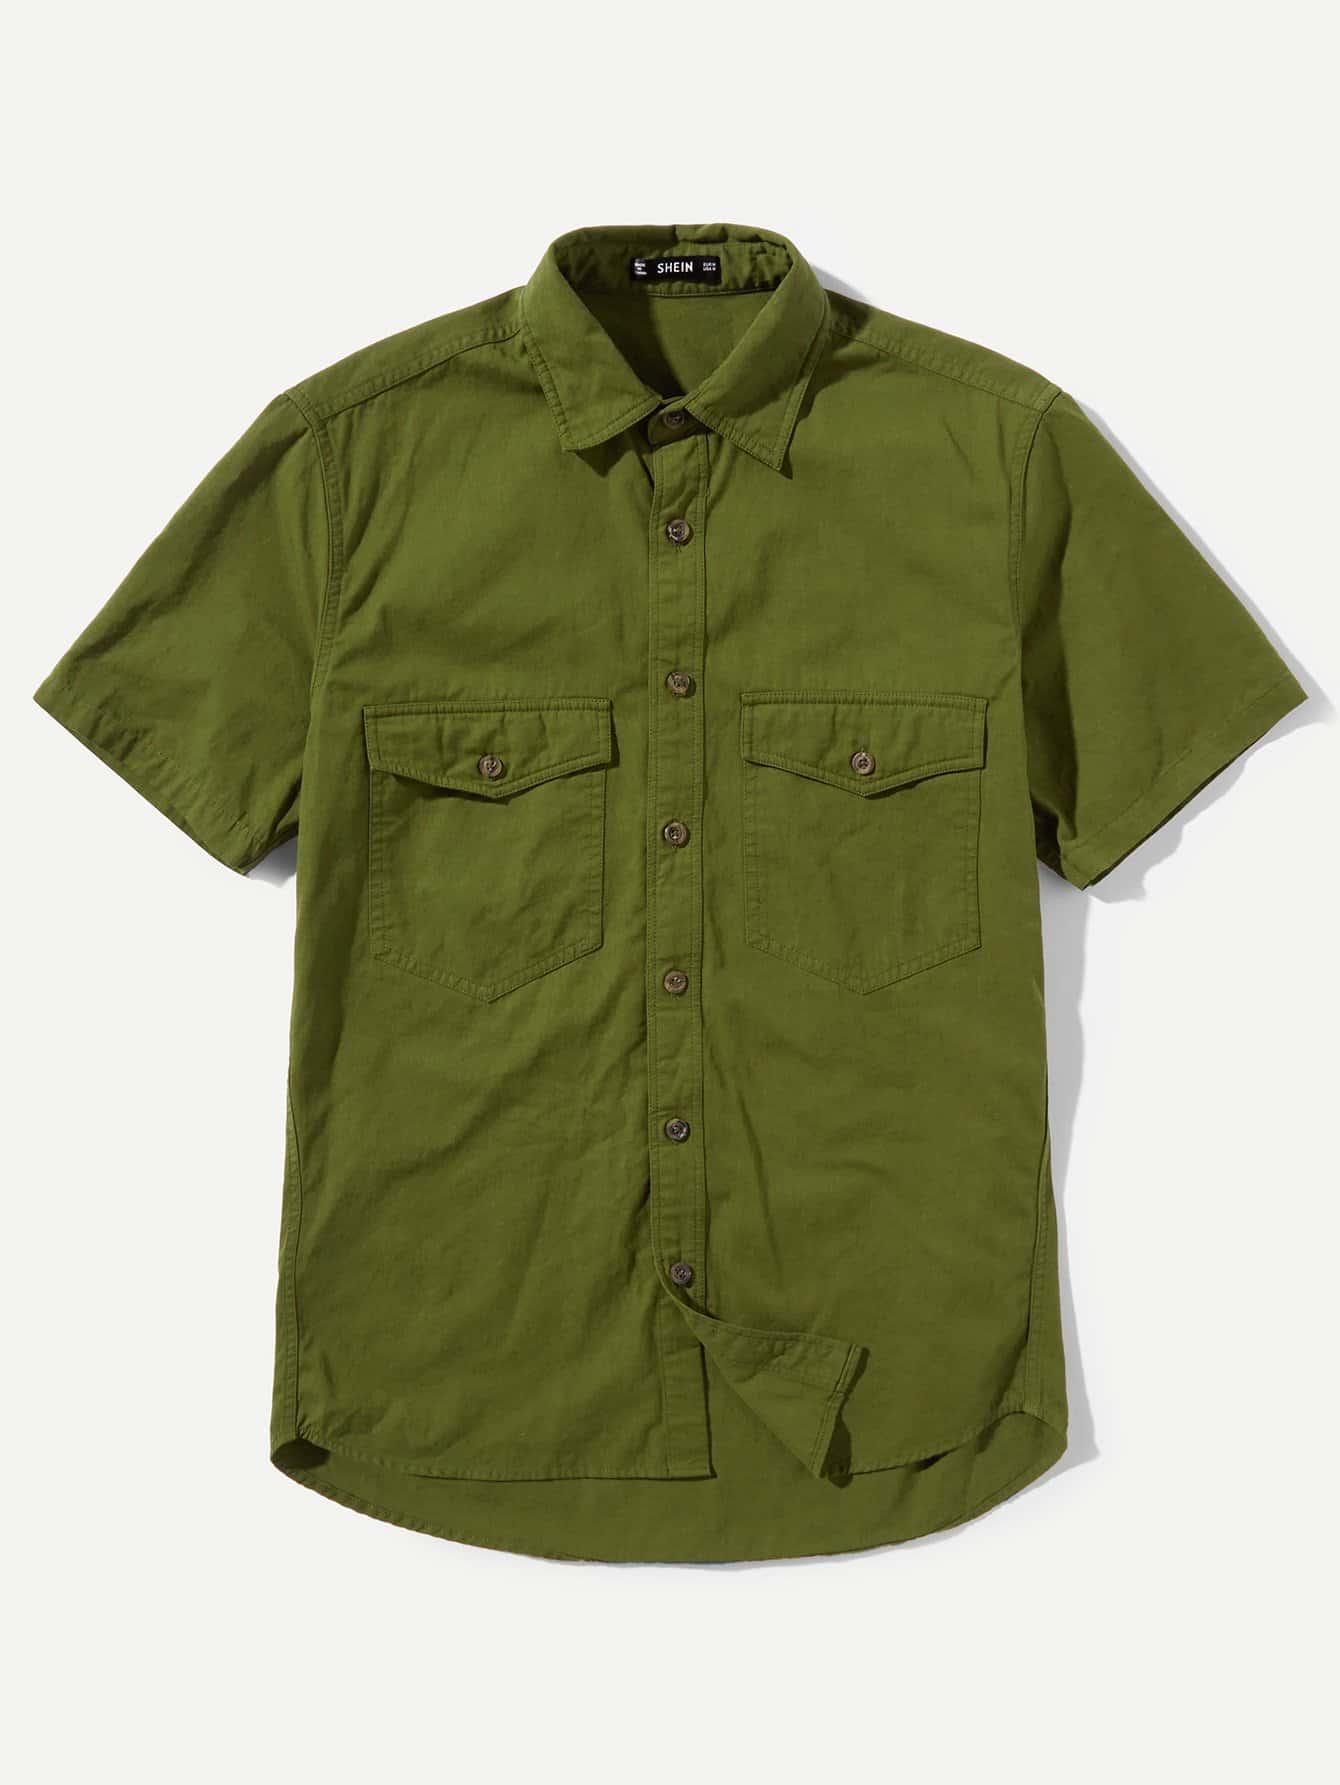 Купить Мужская Карманная Фронтовая Изогнутая Рубашка, null, SheIn